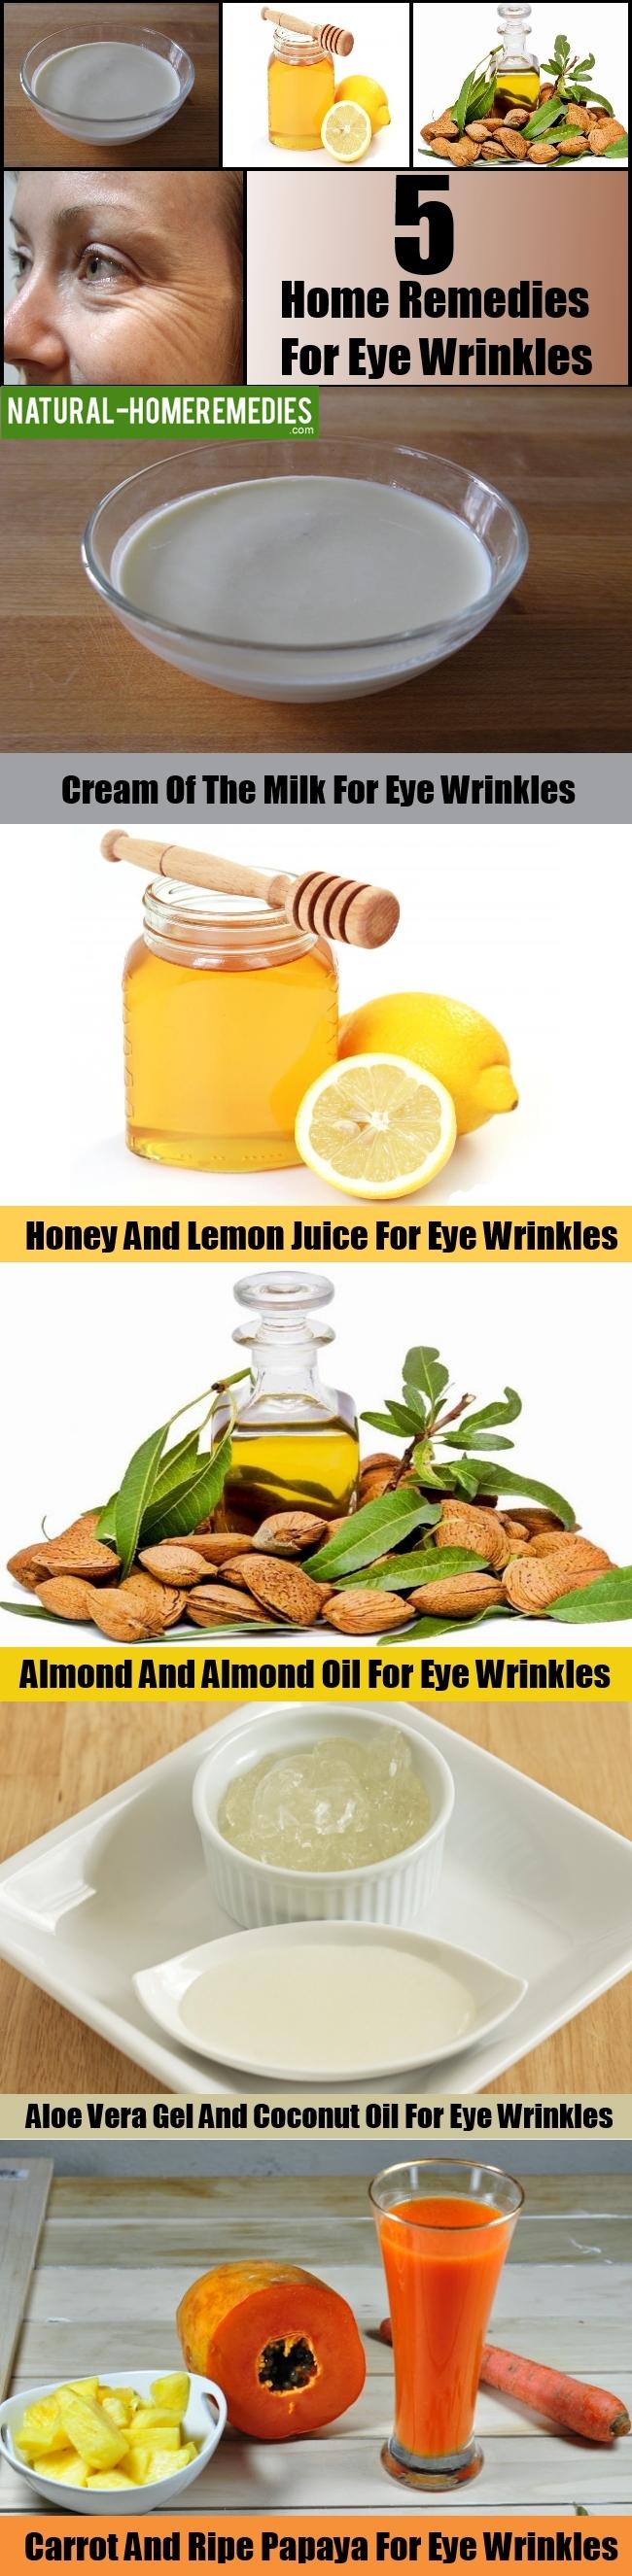 5 Best Home Remedies For Eye Wrinkles